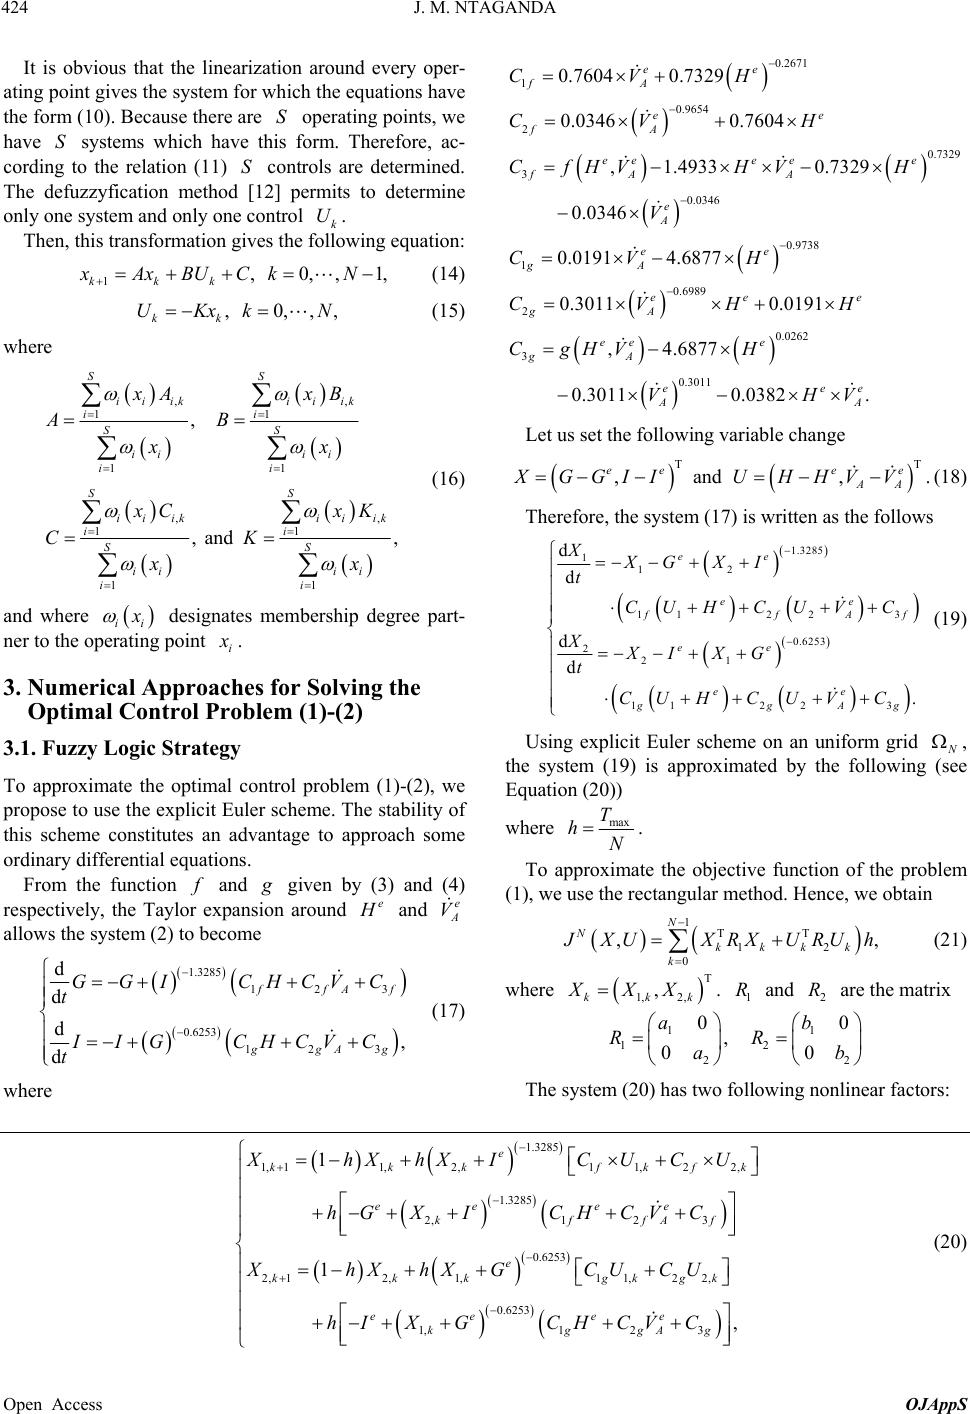 optimal control linear quadratic methods pdf